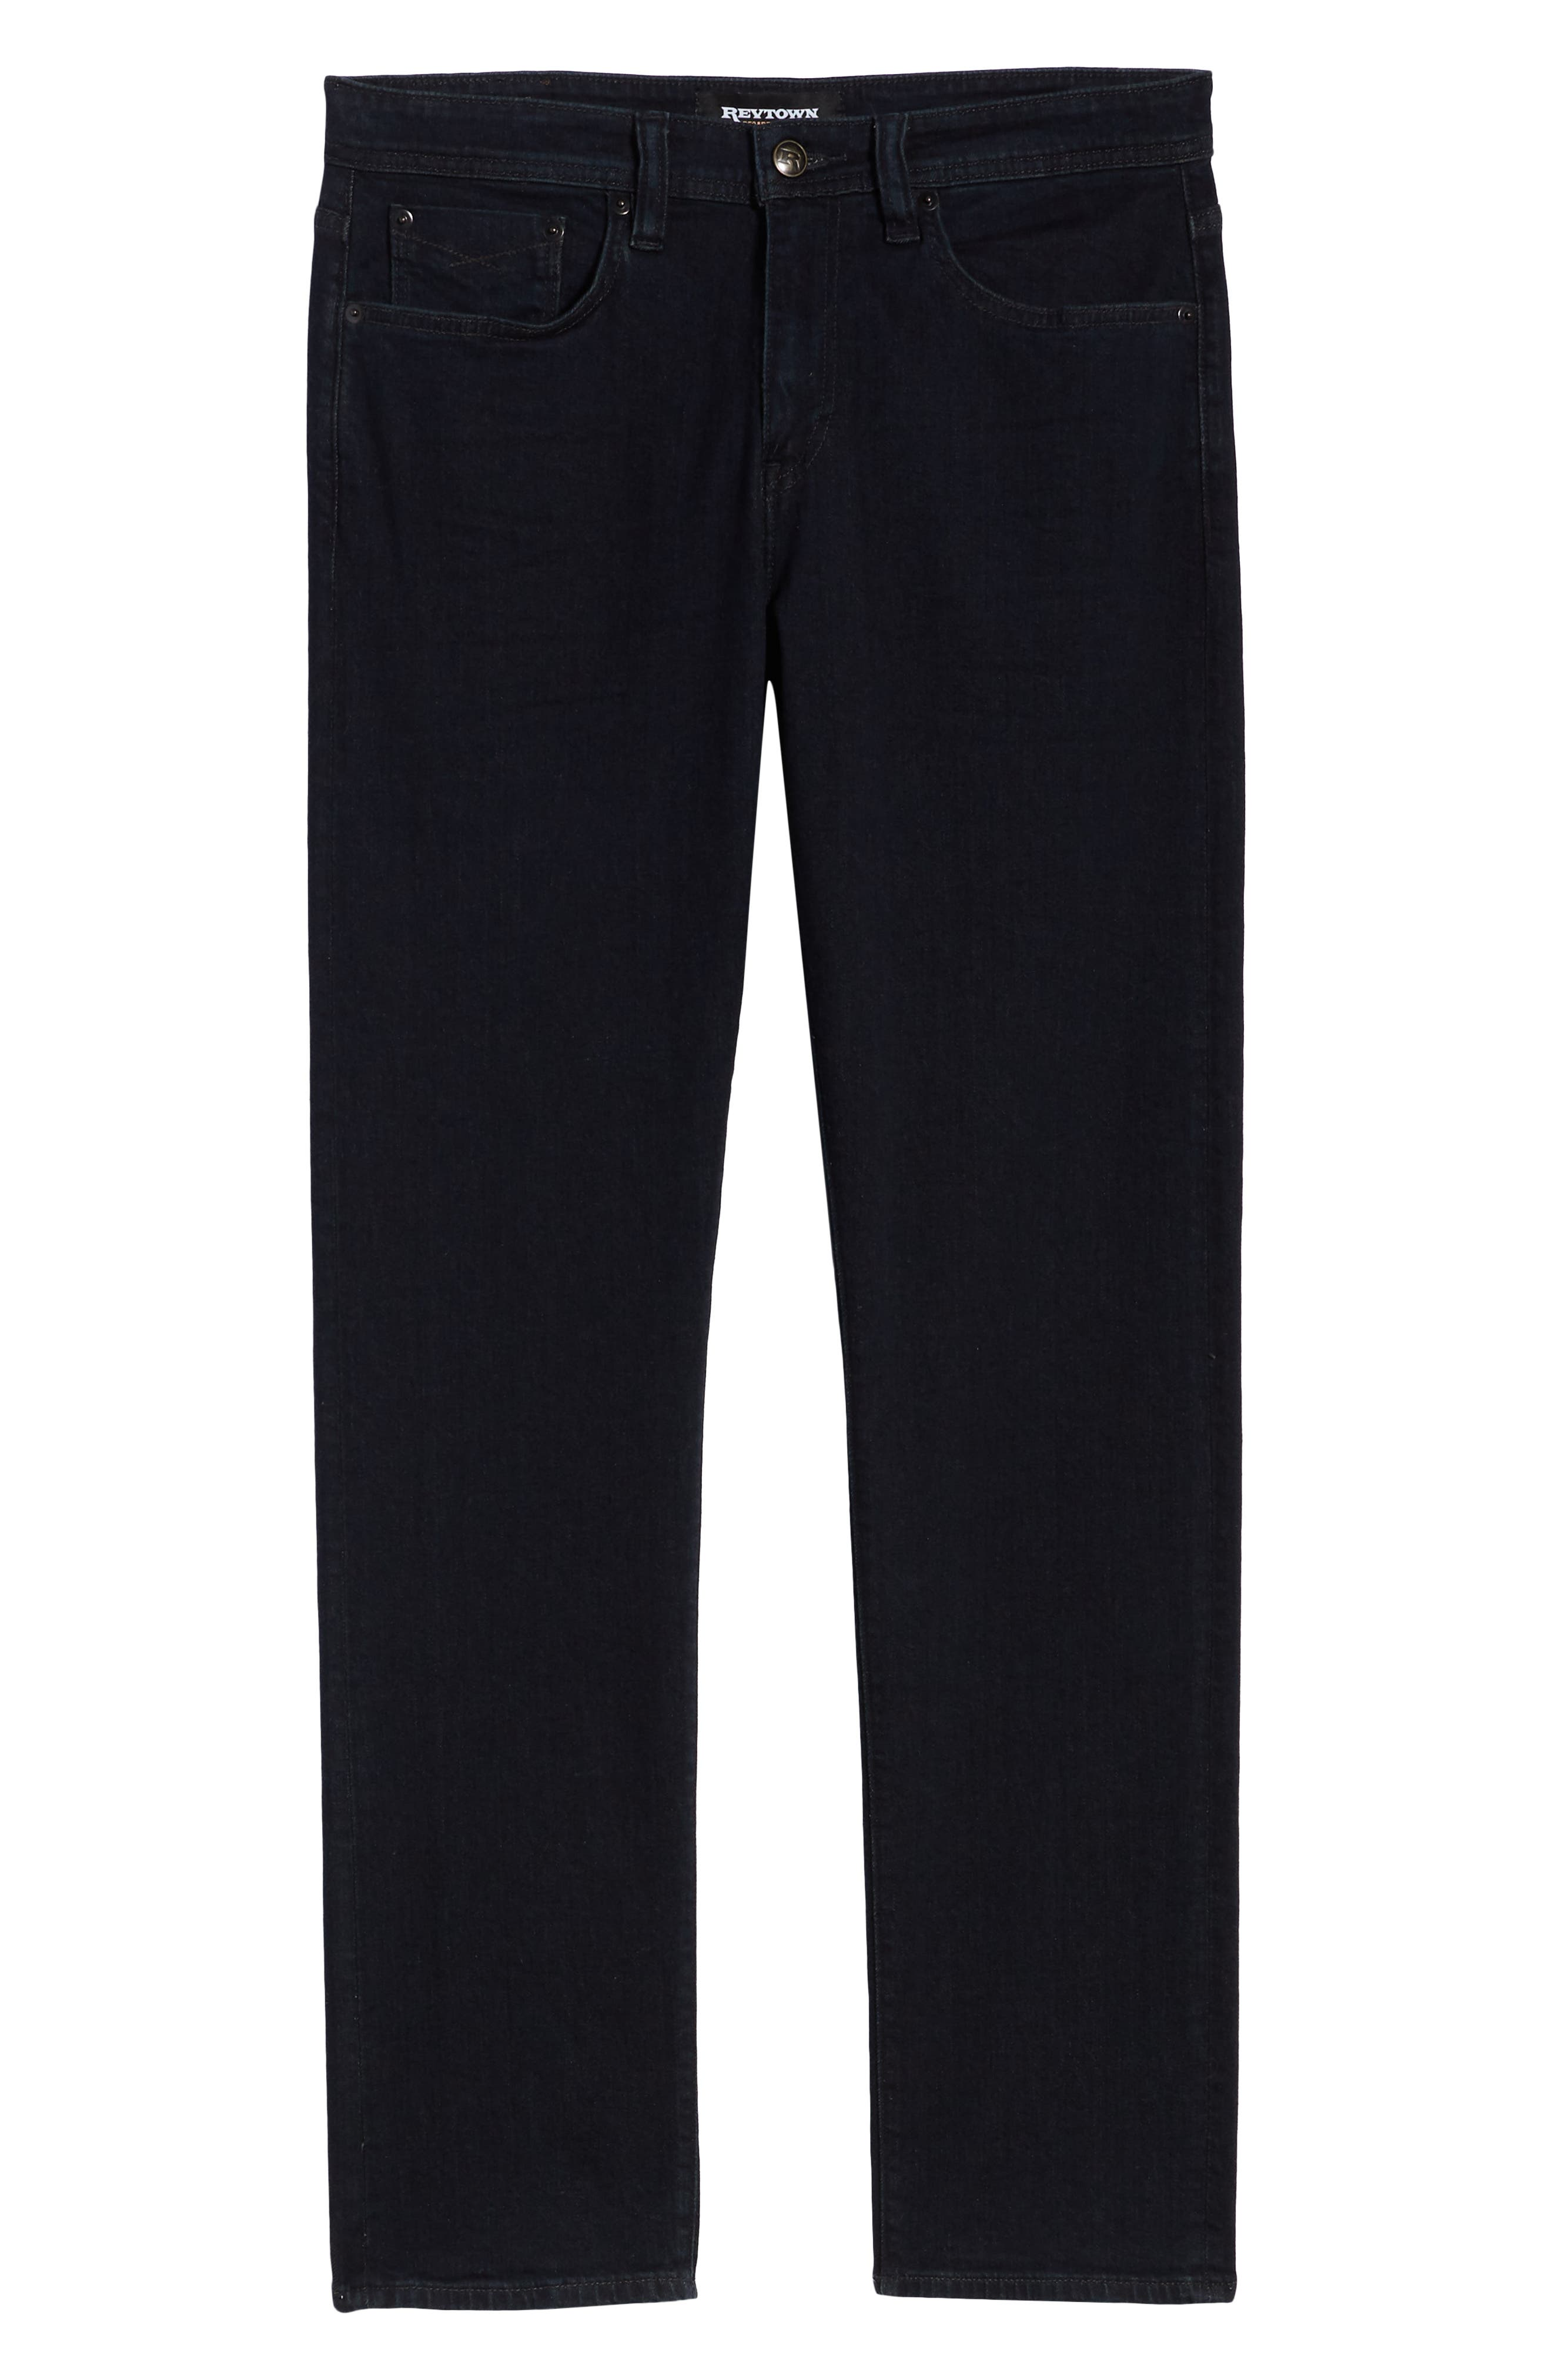 REVTOWN,                             Automatic Straight Leg Jeans,                             Alternate thumbnail 6, color,                             RINSE INDIGO